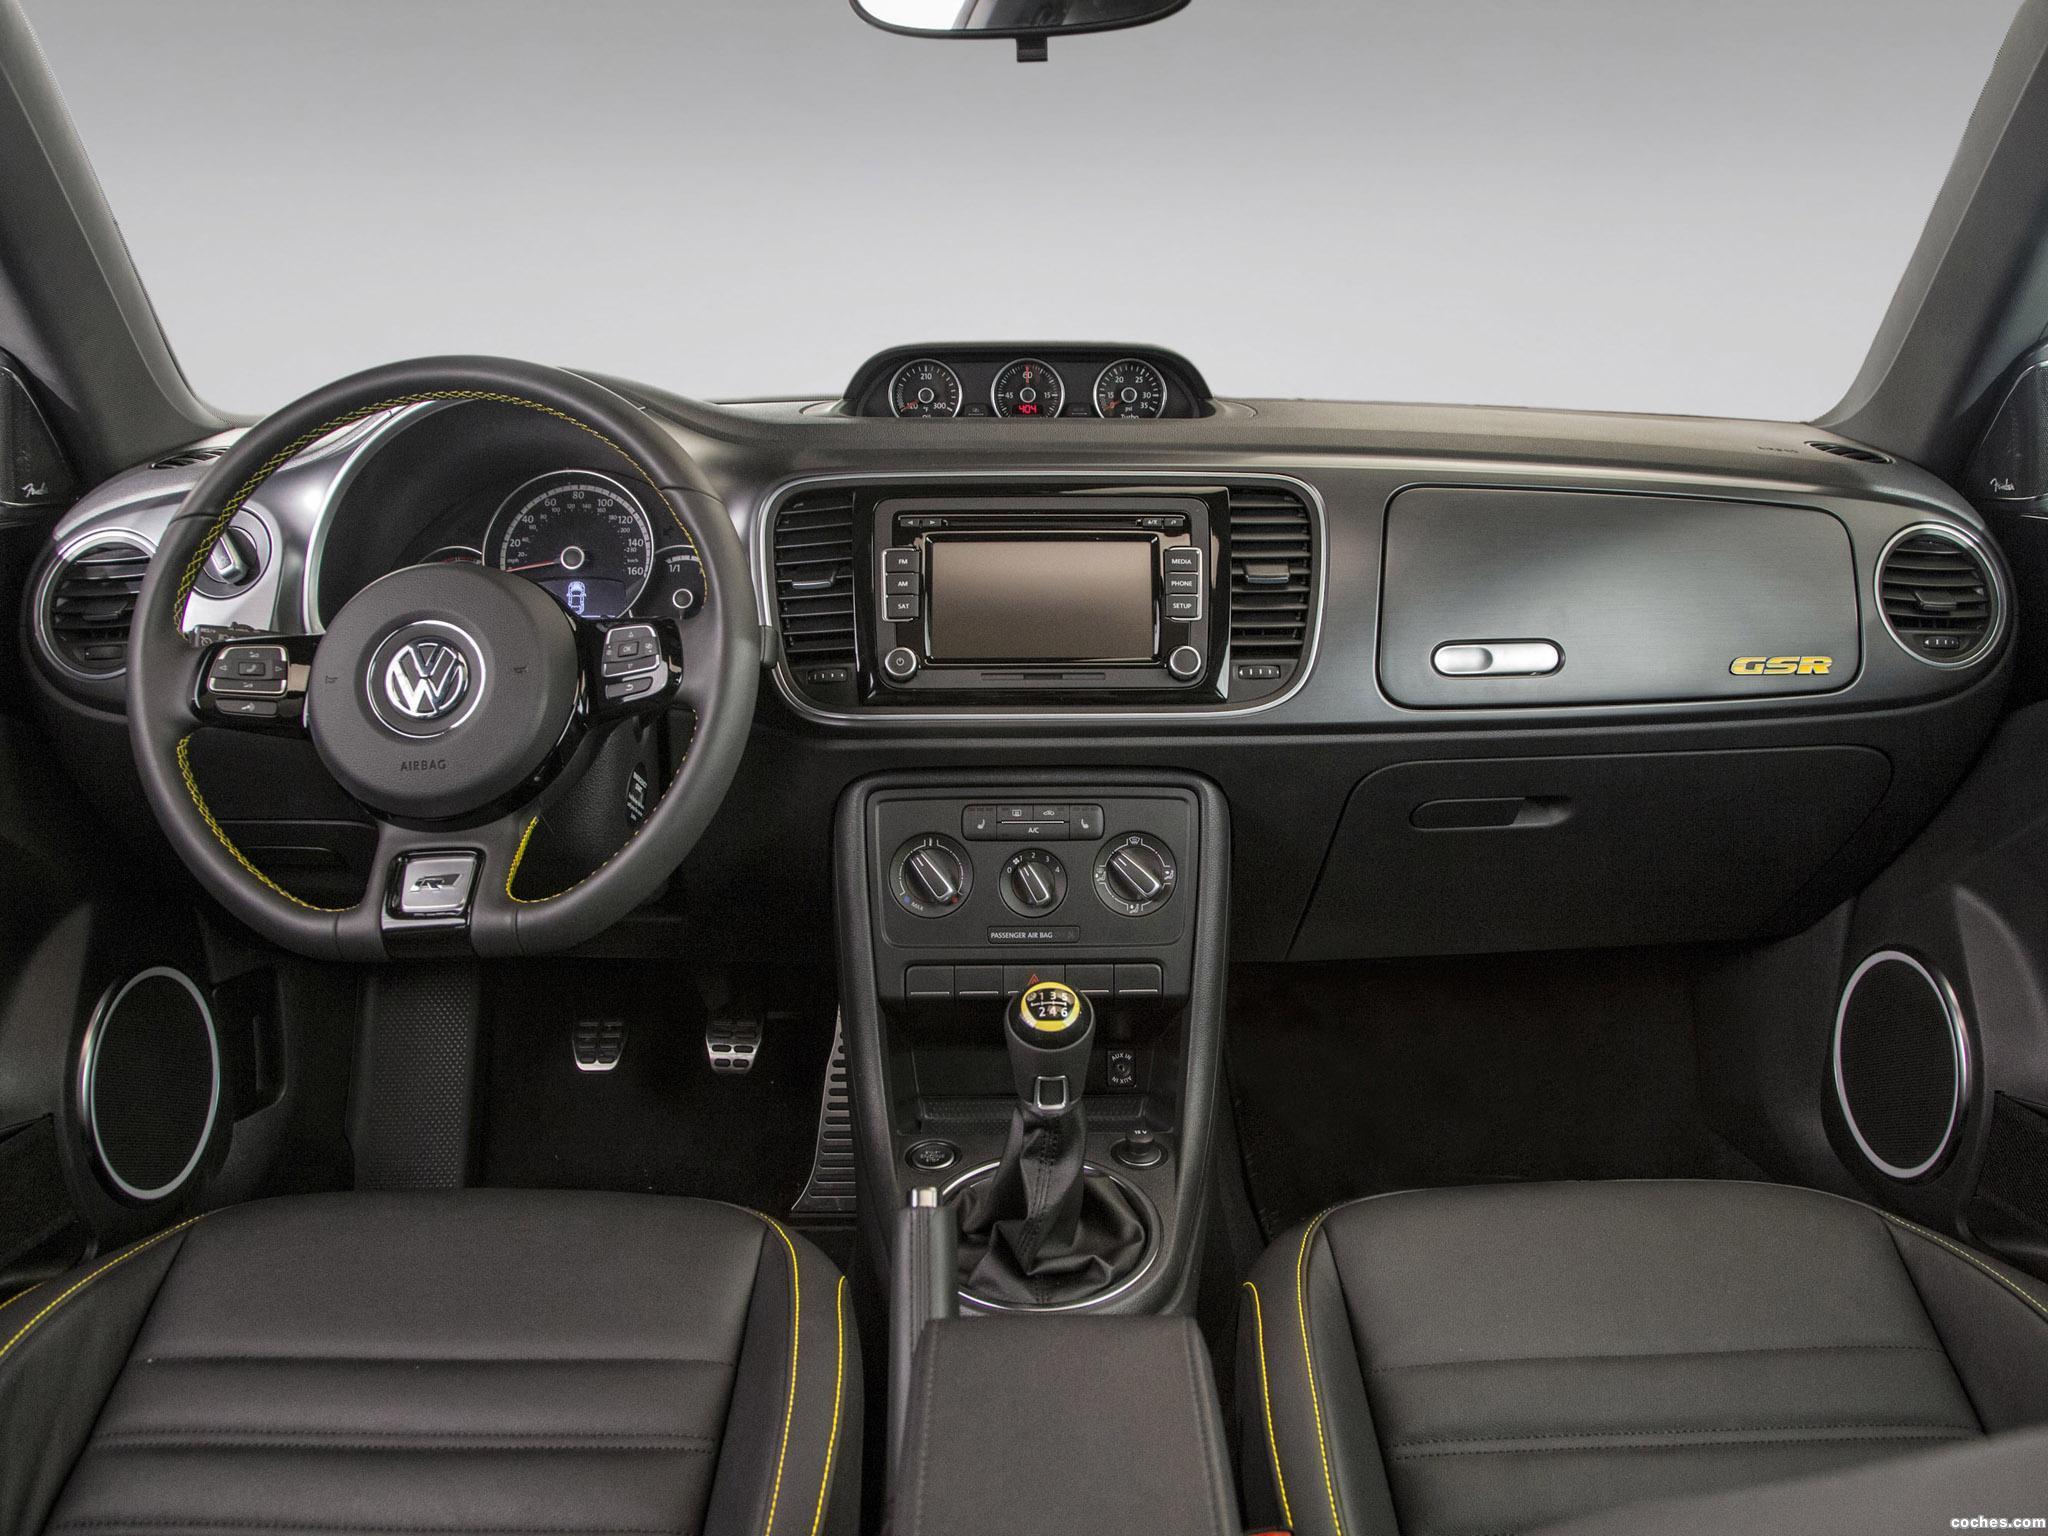 Foto 6 de Volkswagen Beetle GSR Limited Edition 2013